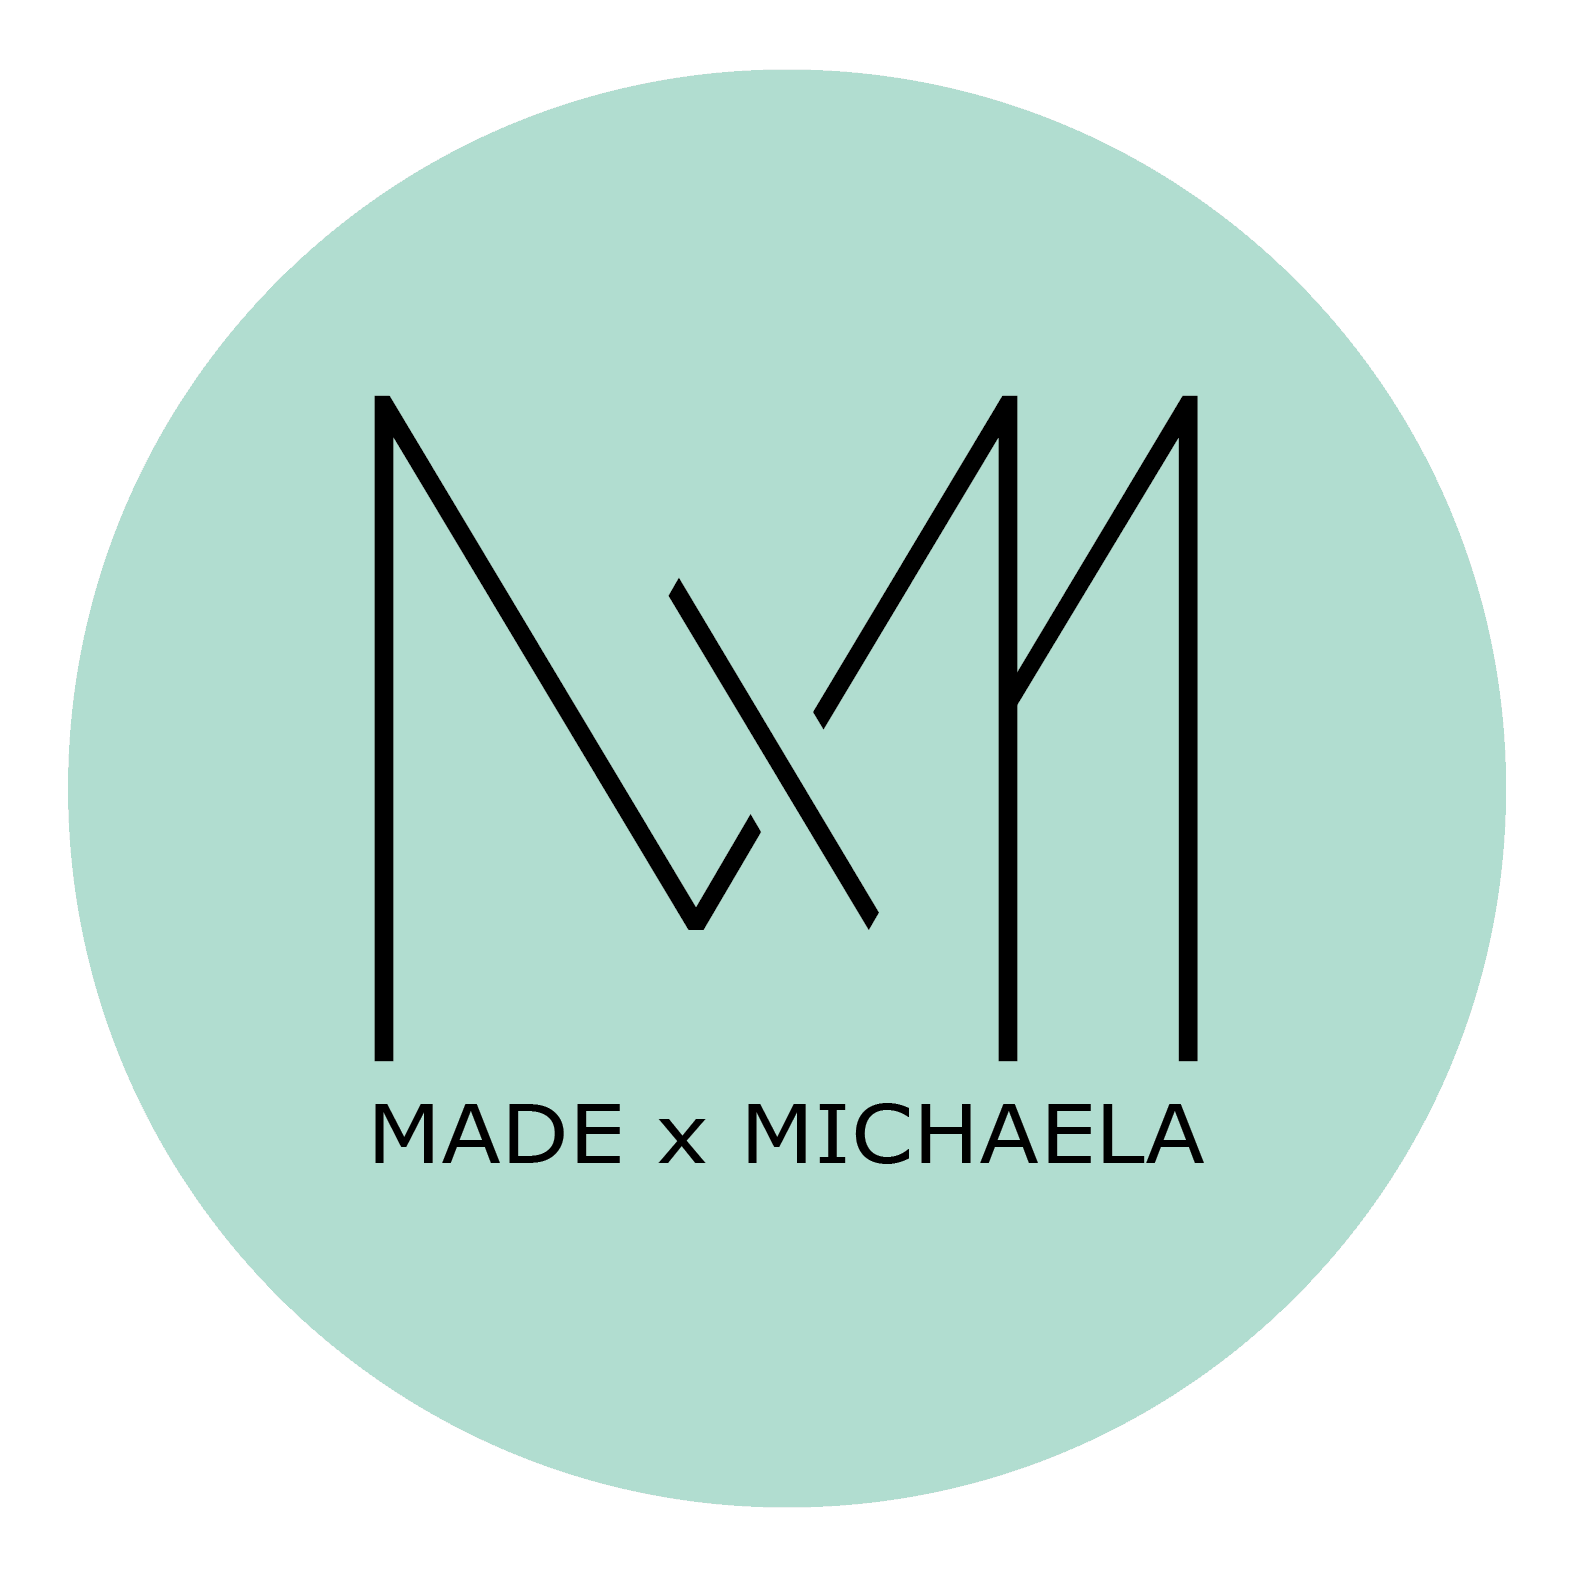 MadeXMichaela